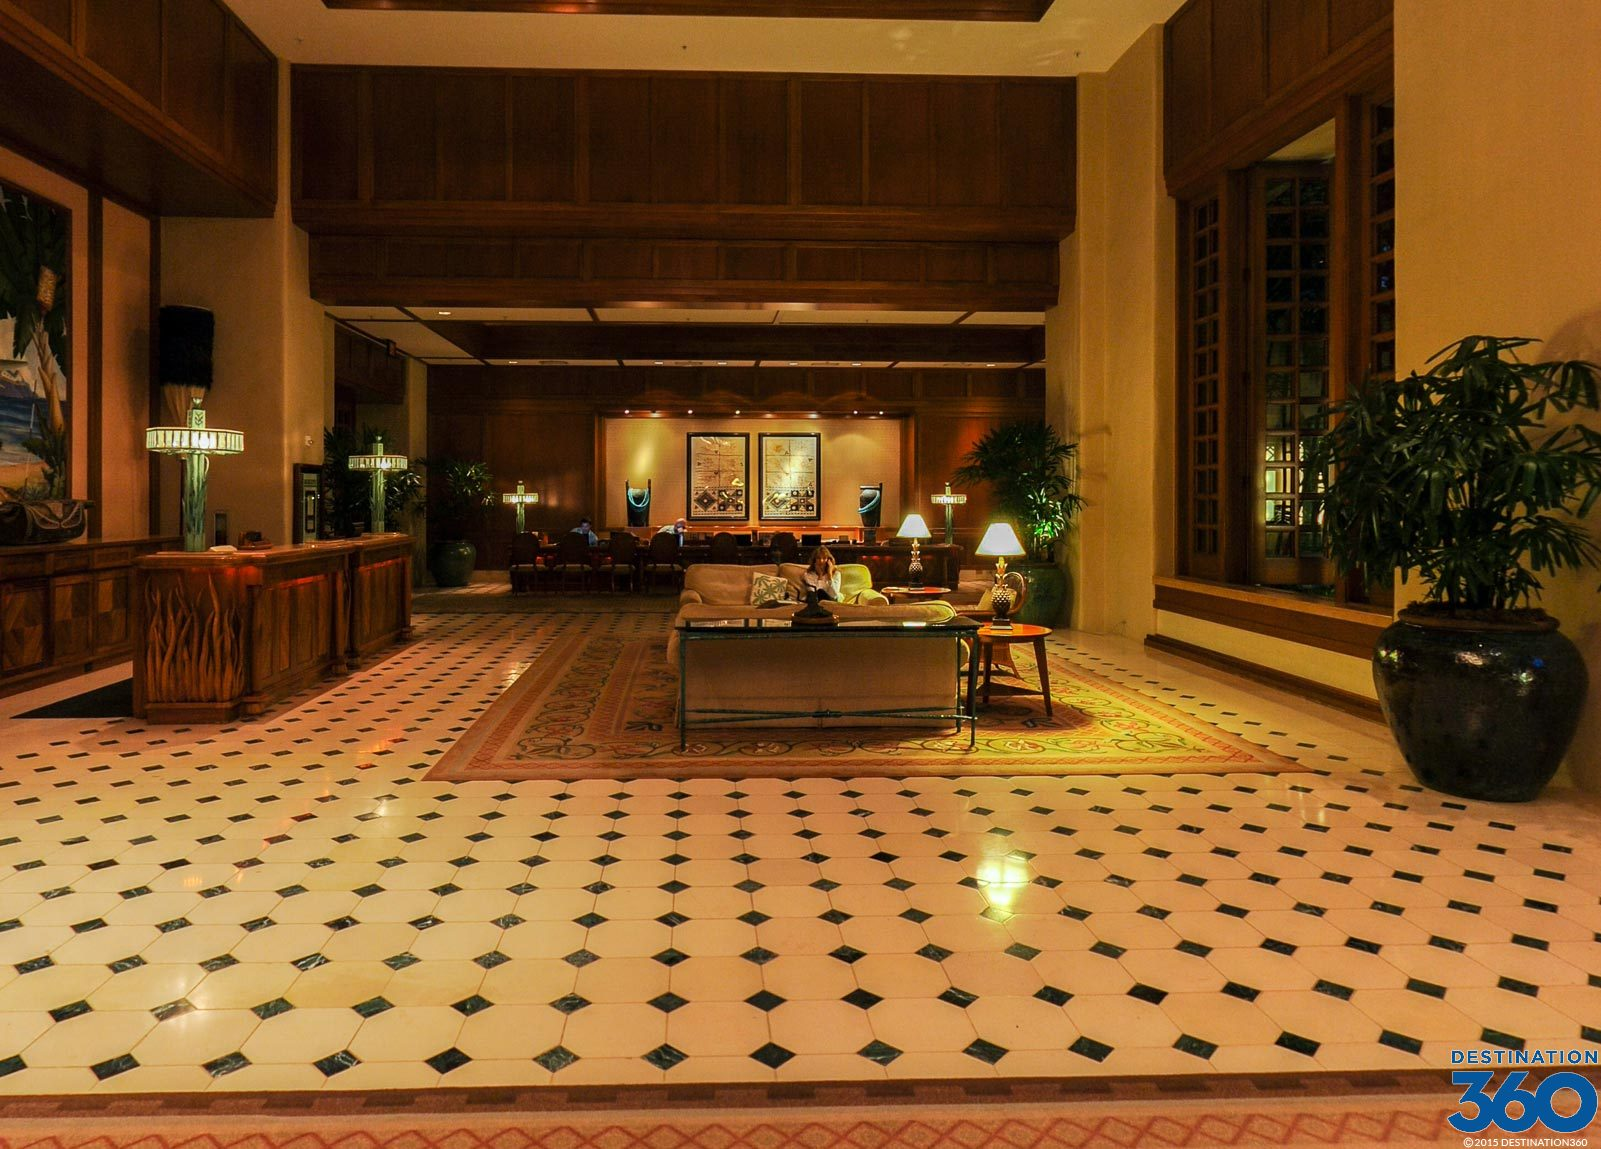 Grand Hyatt Kauai Lobby Lobby Of The Kauai Grand Hyatt